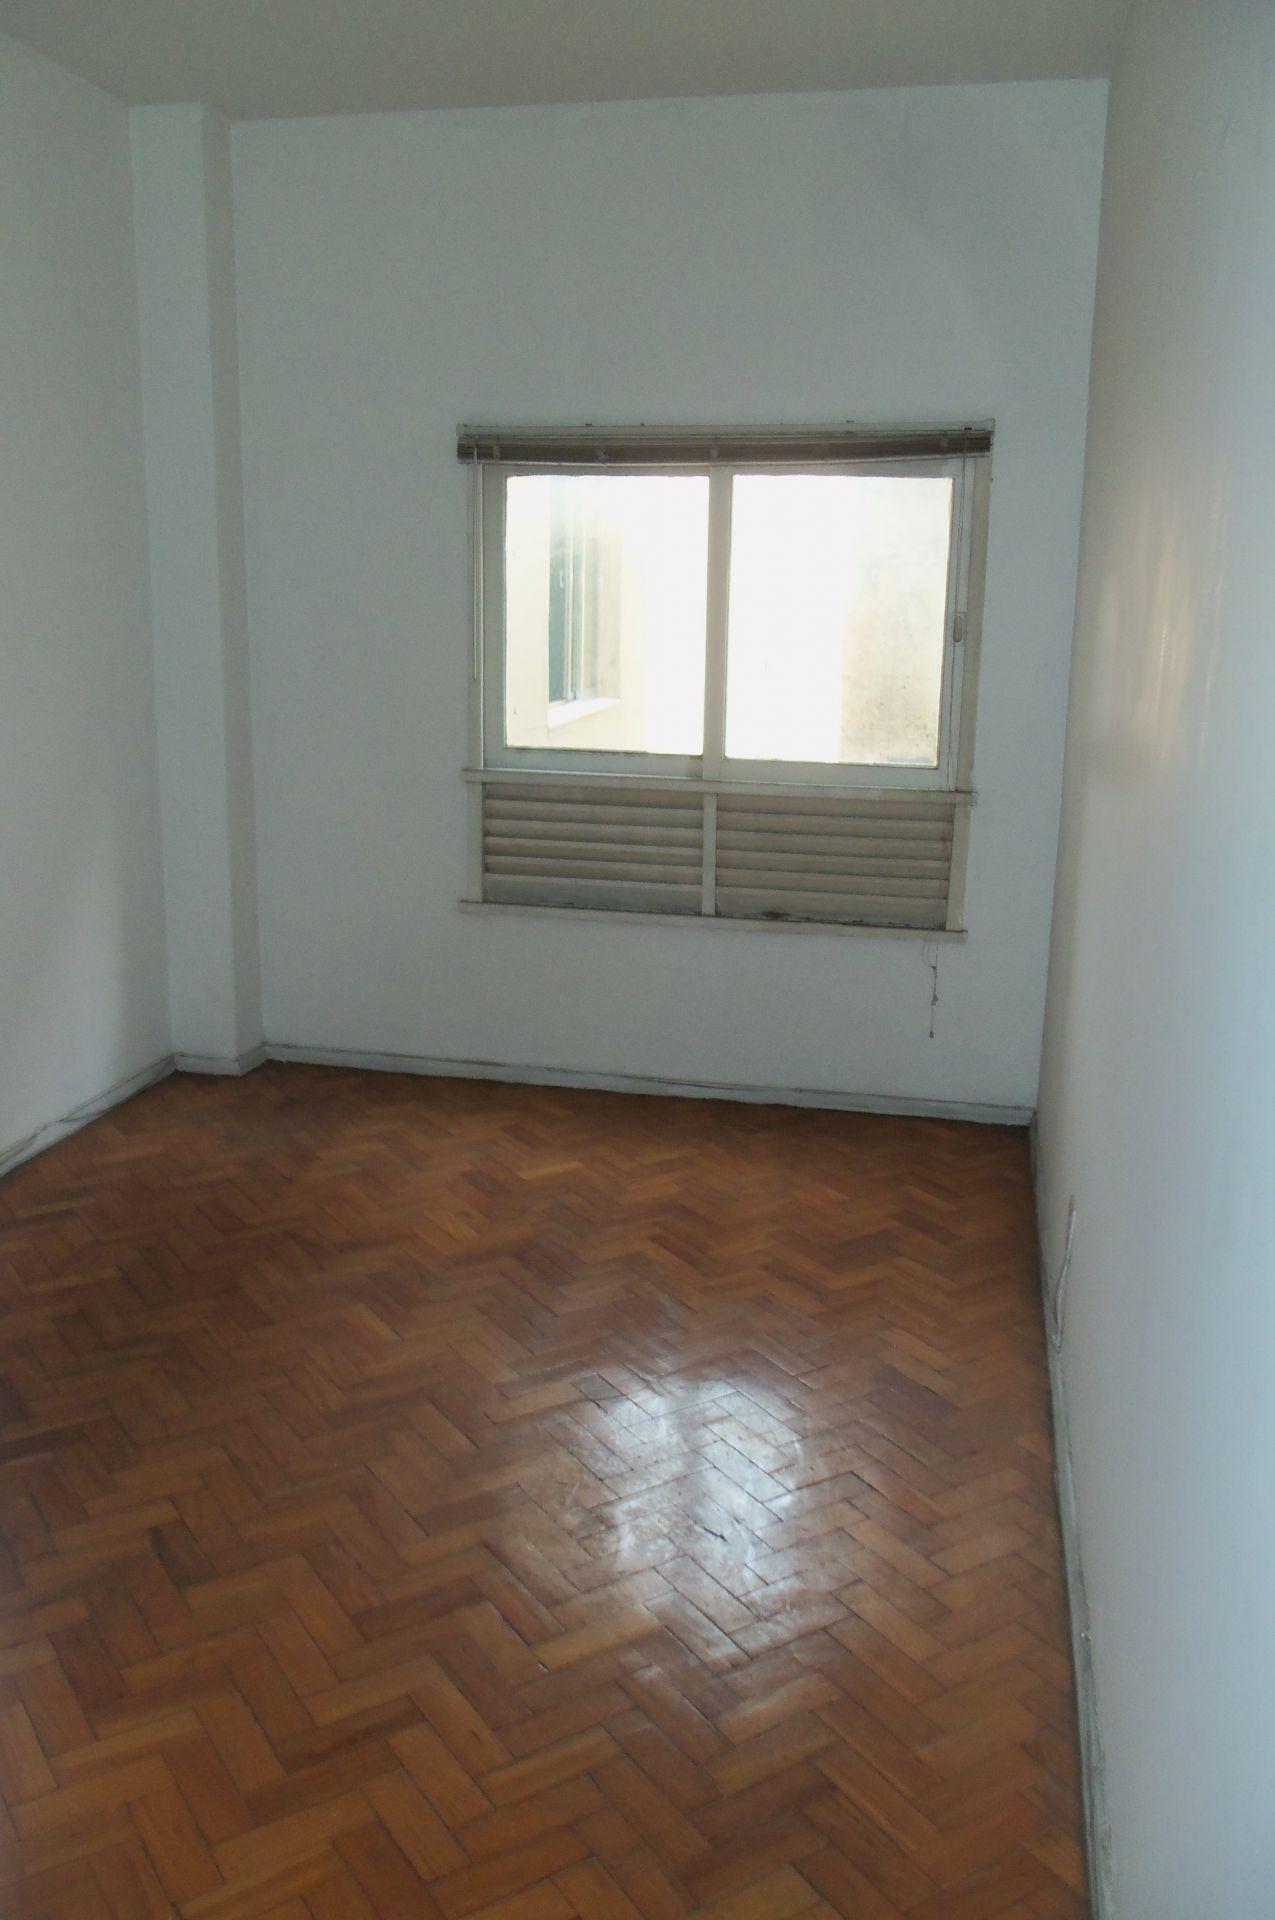 Sala Comercial 20m² para alugar Rua Frederico Meier,Méier, Rio de Janeiro - R$ 650 - 764 - 1